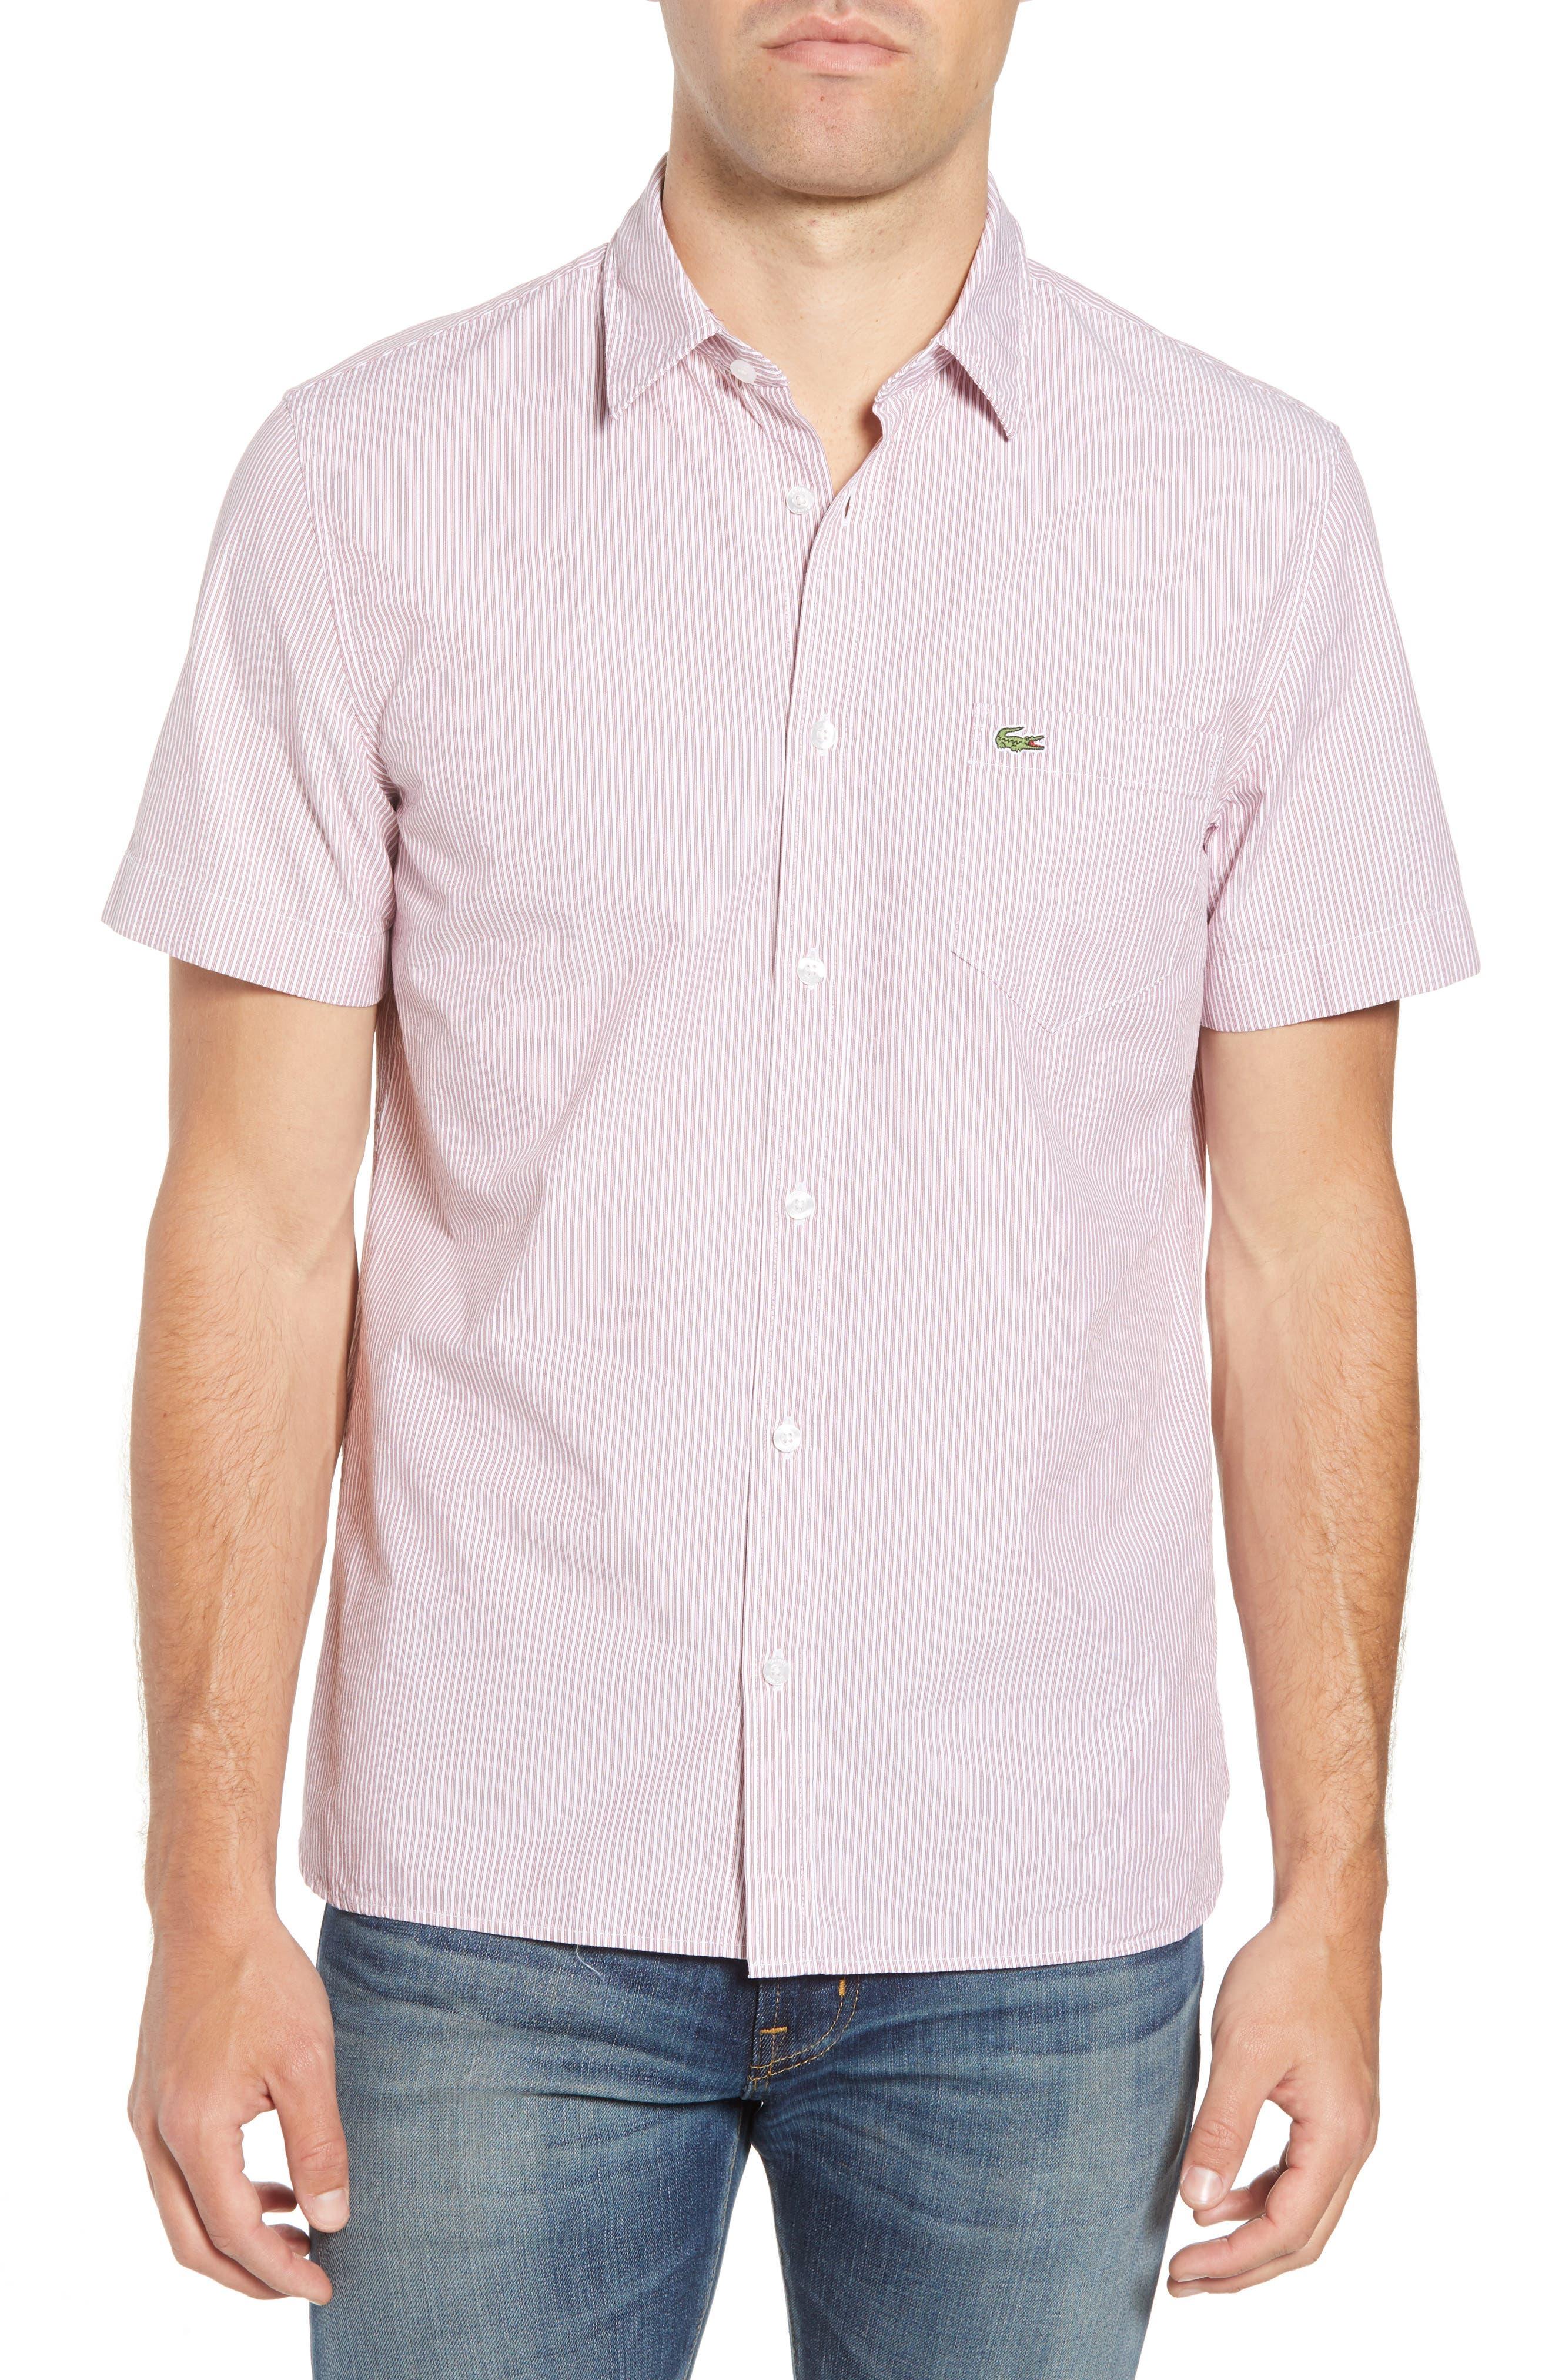 Regular Fit Seersucker Sport Shirt,                             Main thumbnail 1, color,                             TOREADOR